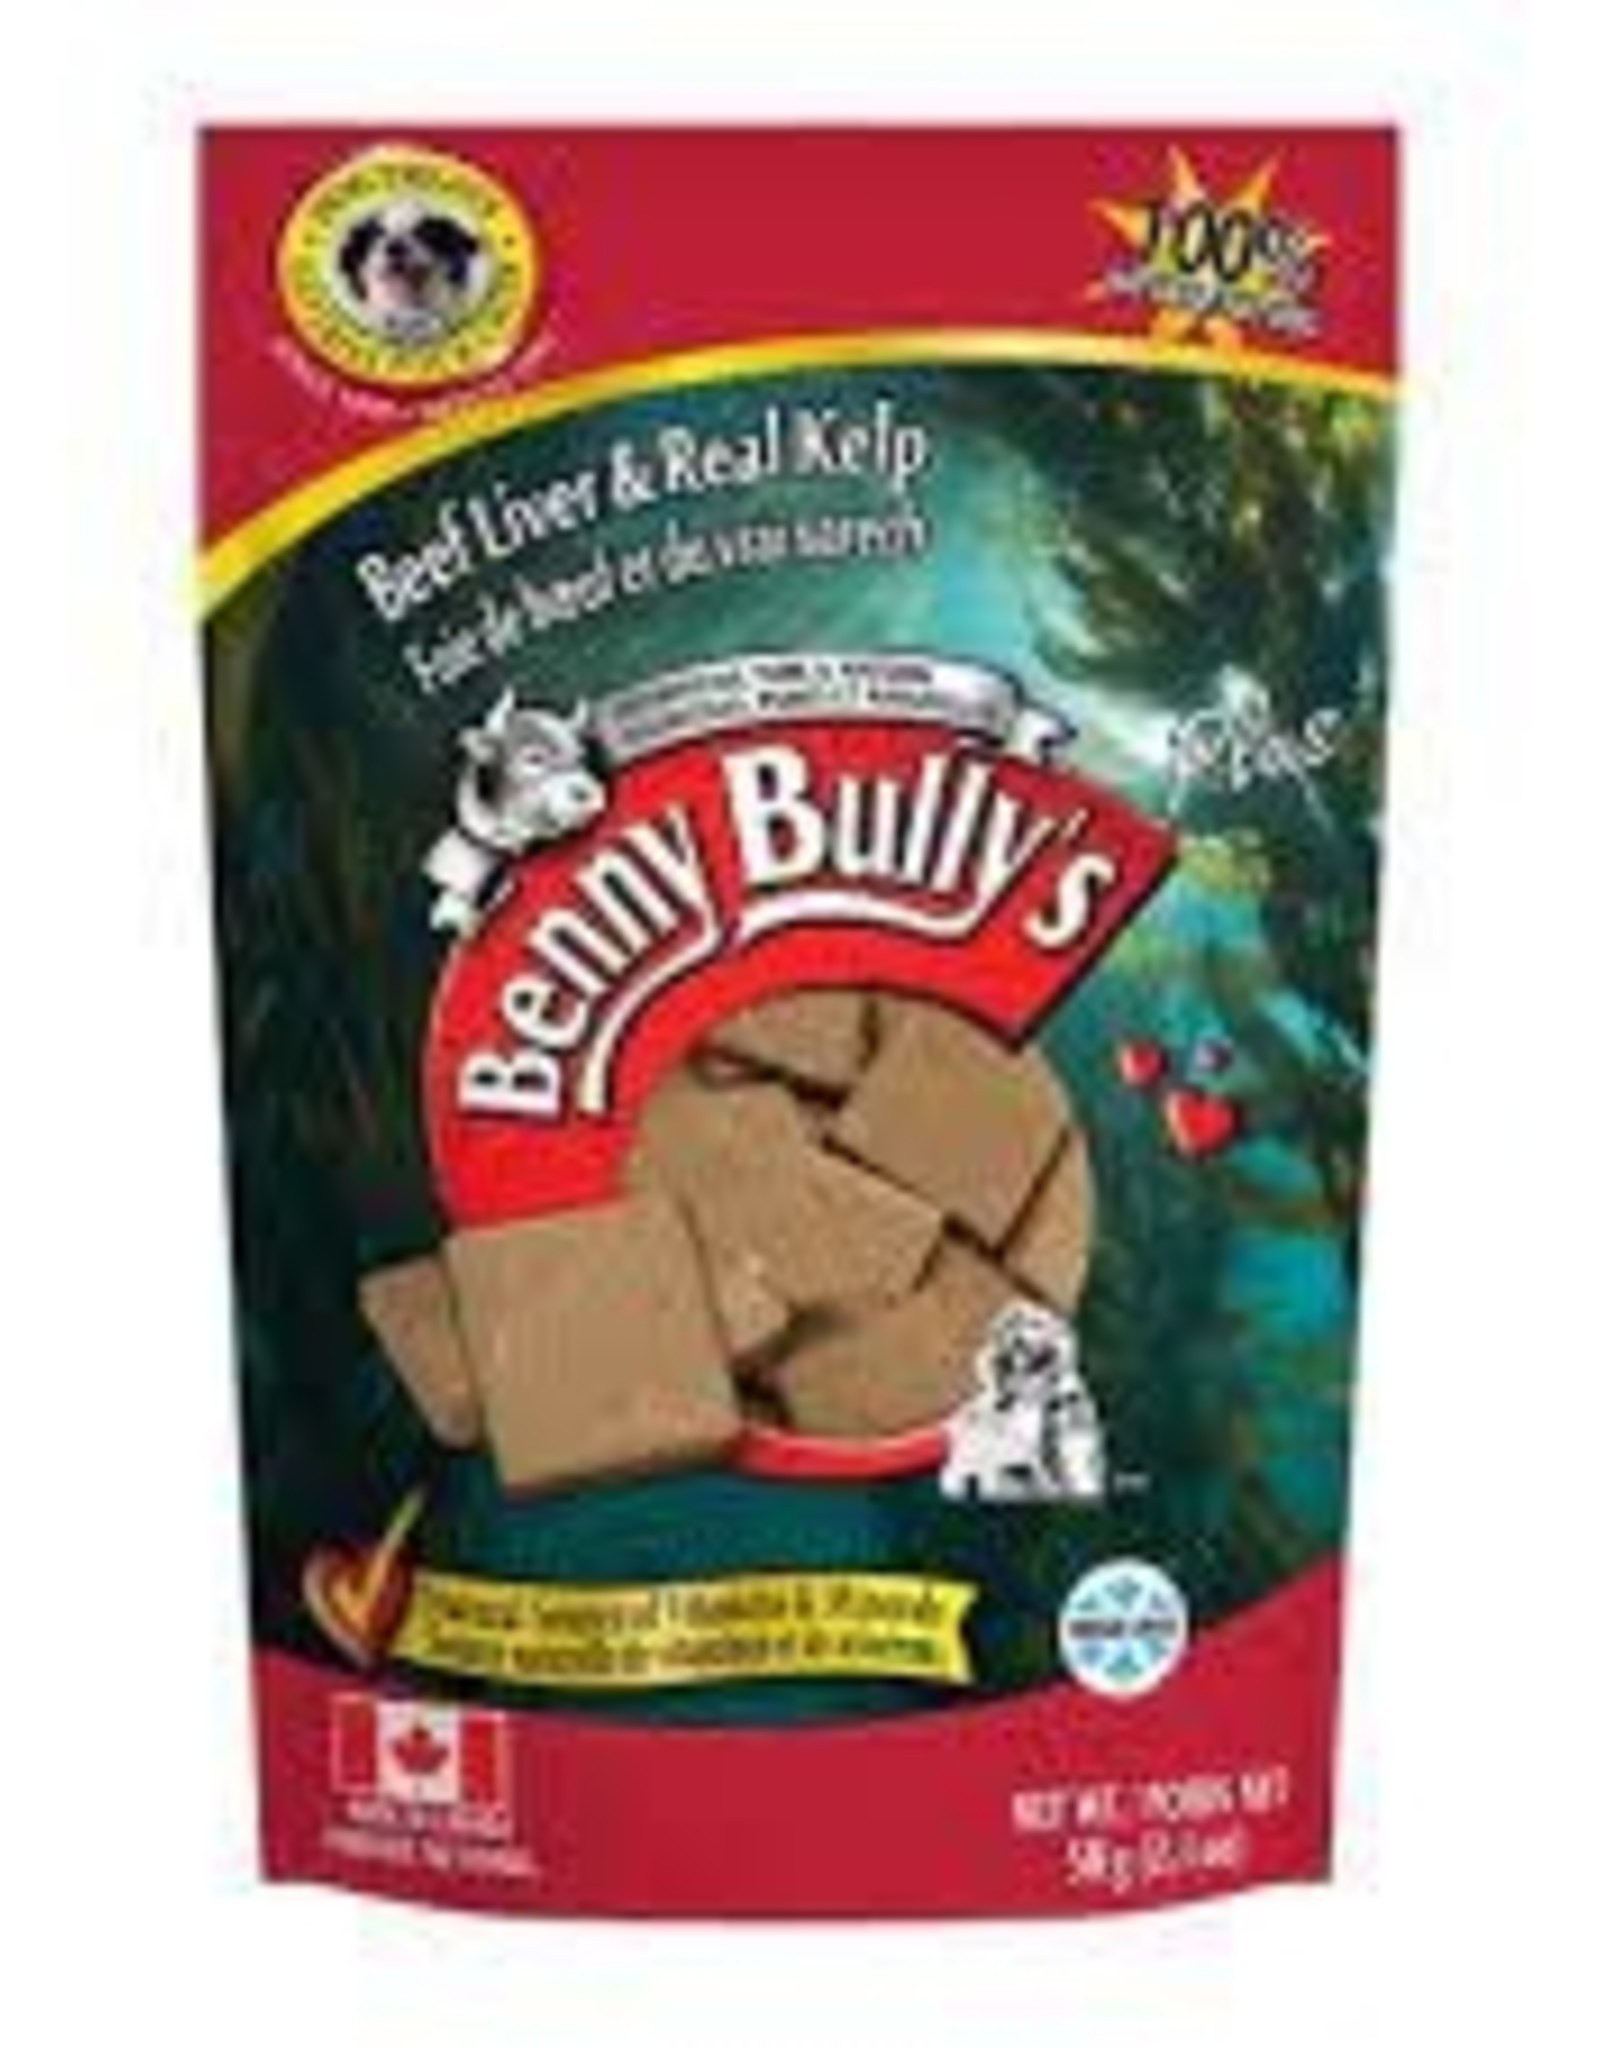 Benny Bully's Benny Bully's Liver Plus Kelp 58 g